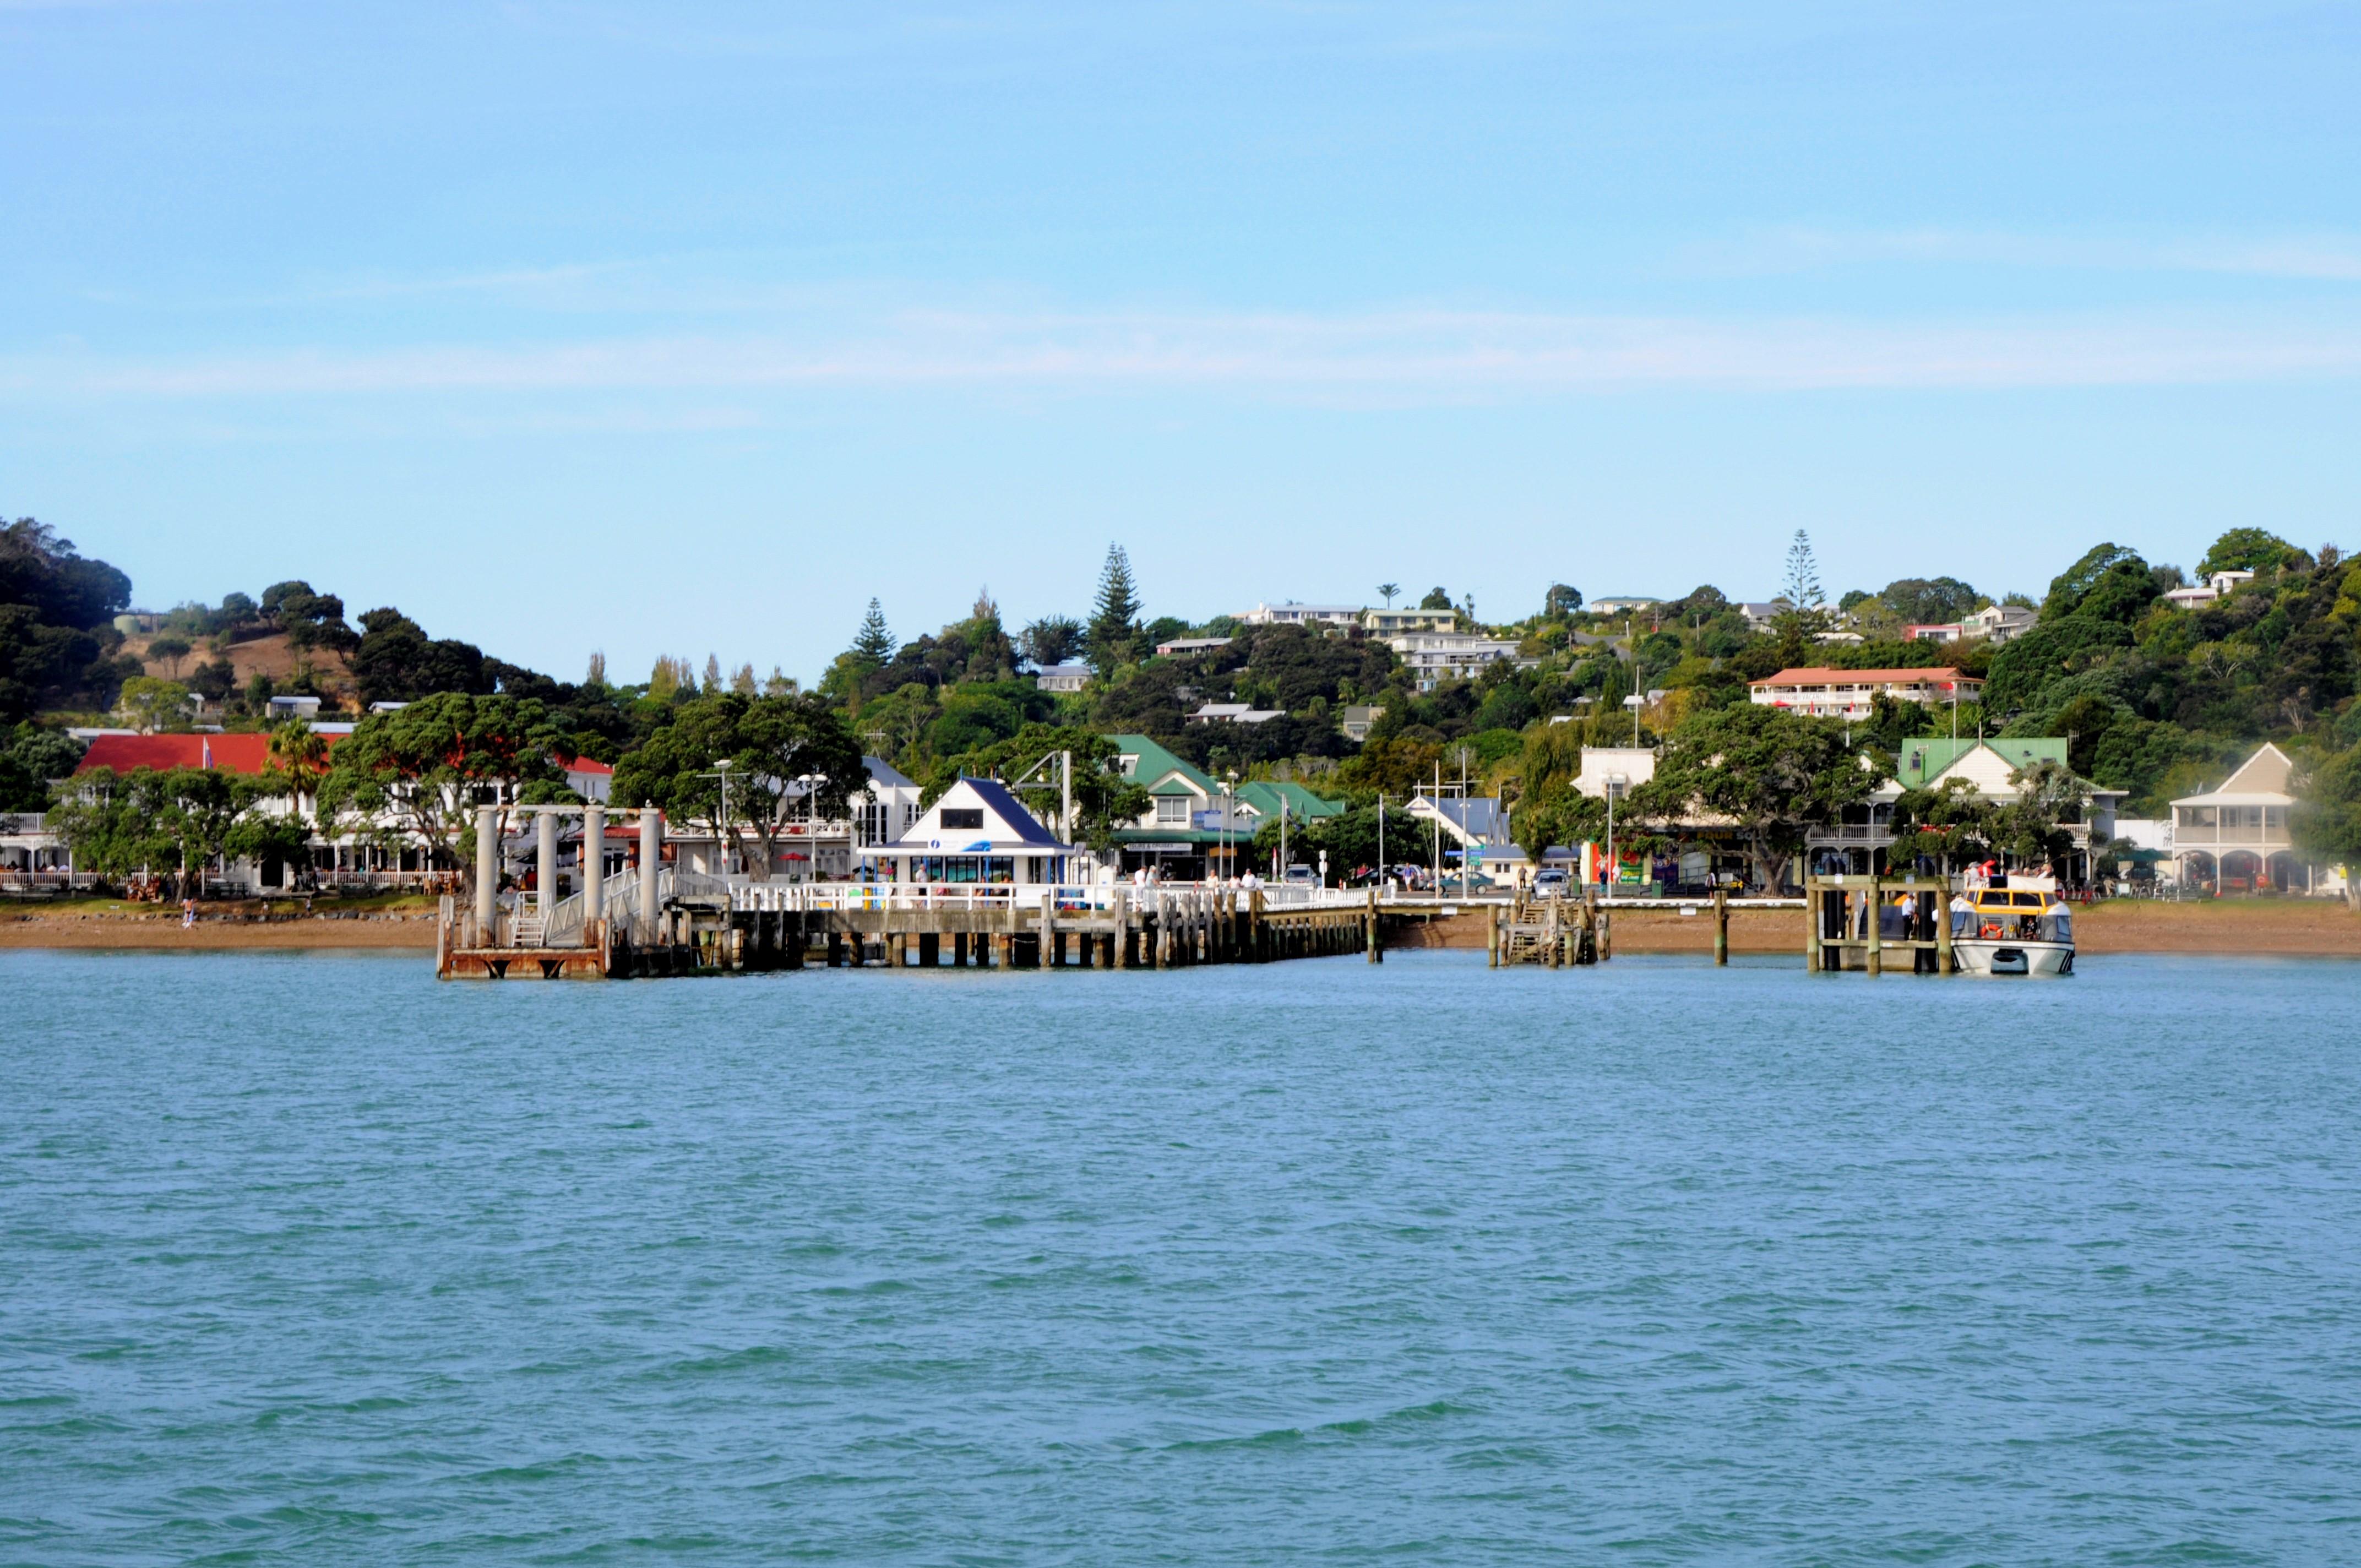 The_pier_of_Paihia,New_Zealand.jpg